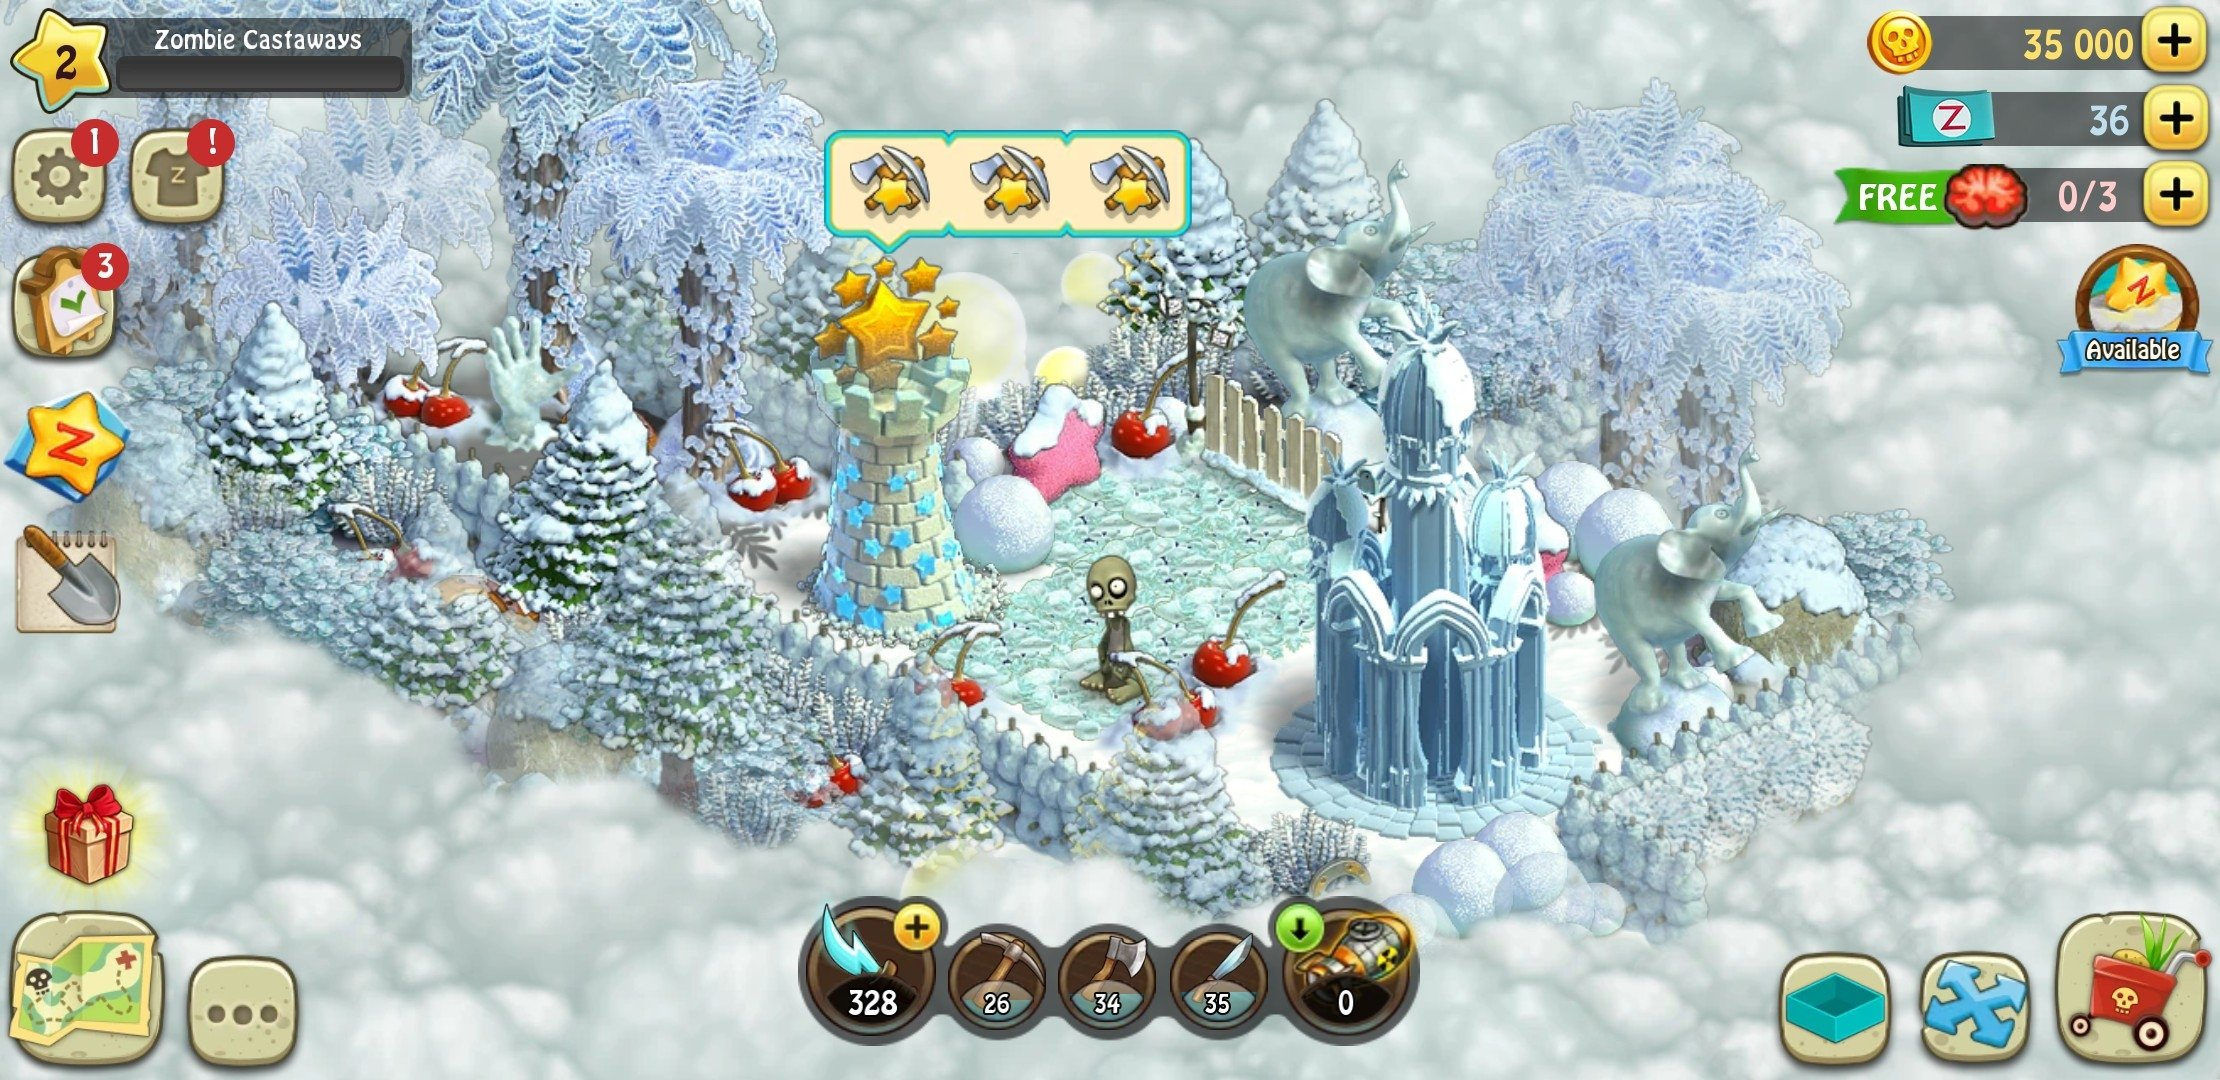 sims castaway apk free download